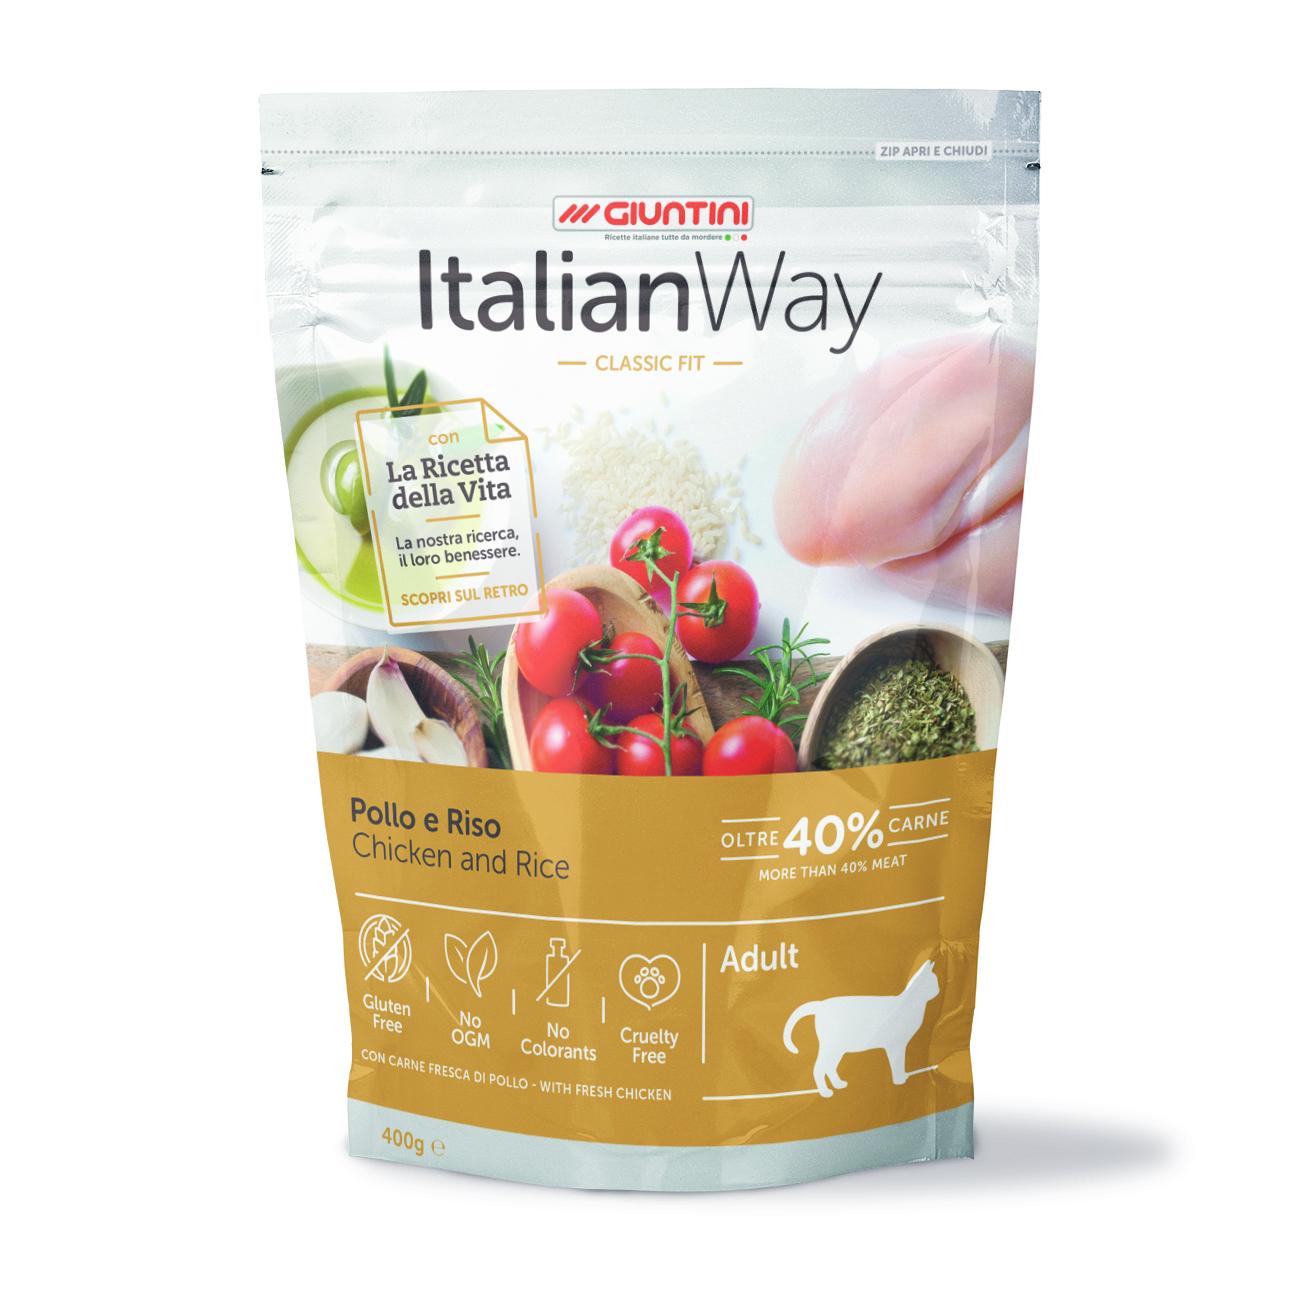 Italian Way Сухой корм для кошек ITALIAN WAY с курицей и рисом 36588.jpg